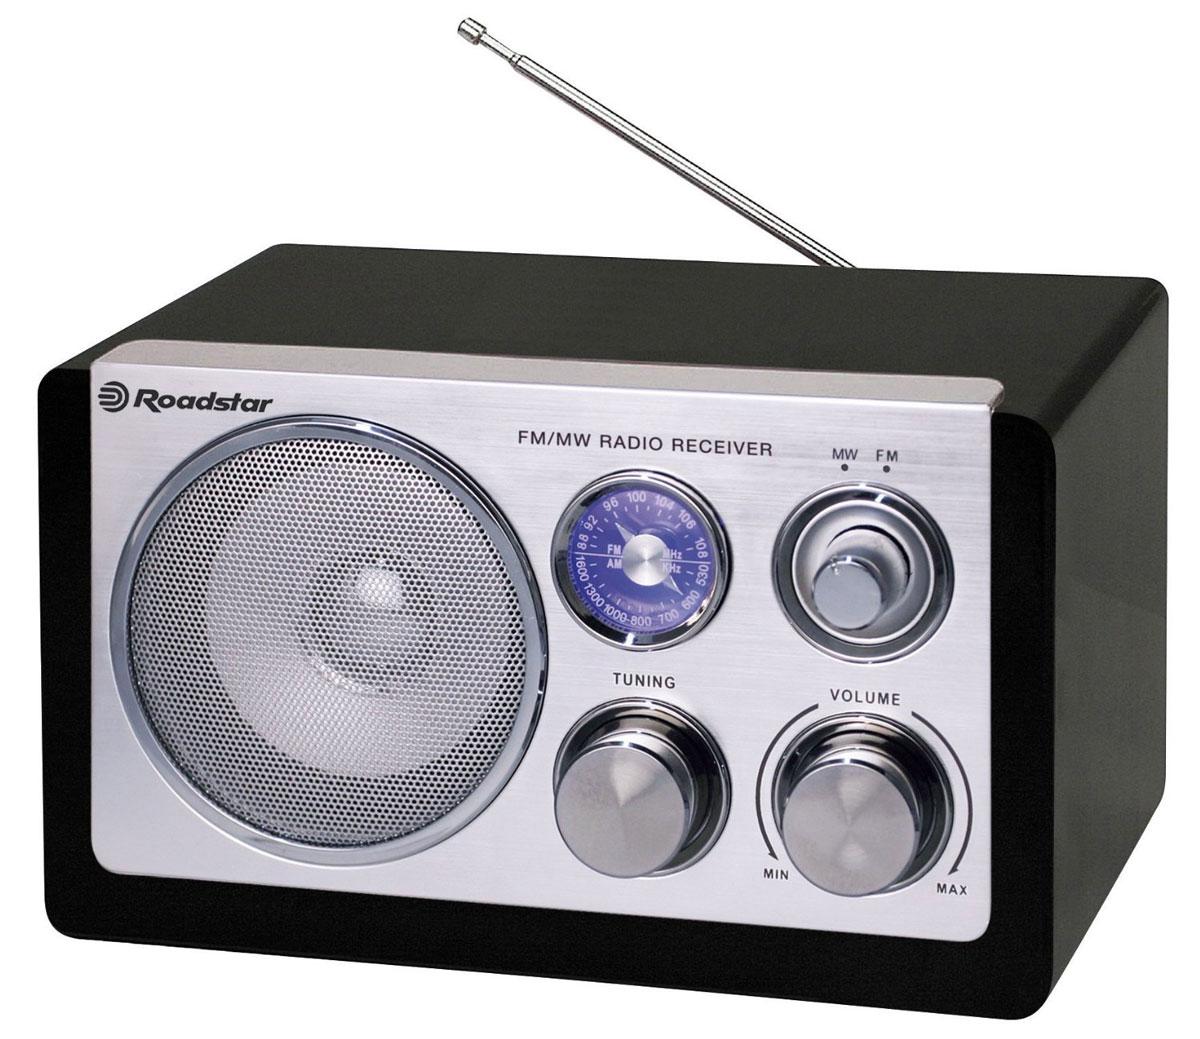 RoadStar HRA-1200N/BK, Black, ретро-радиоприемник